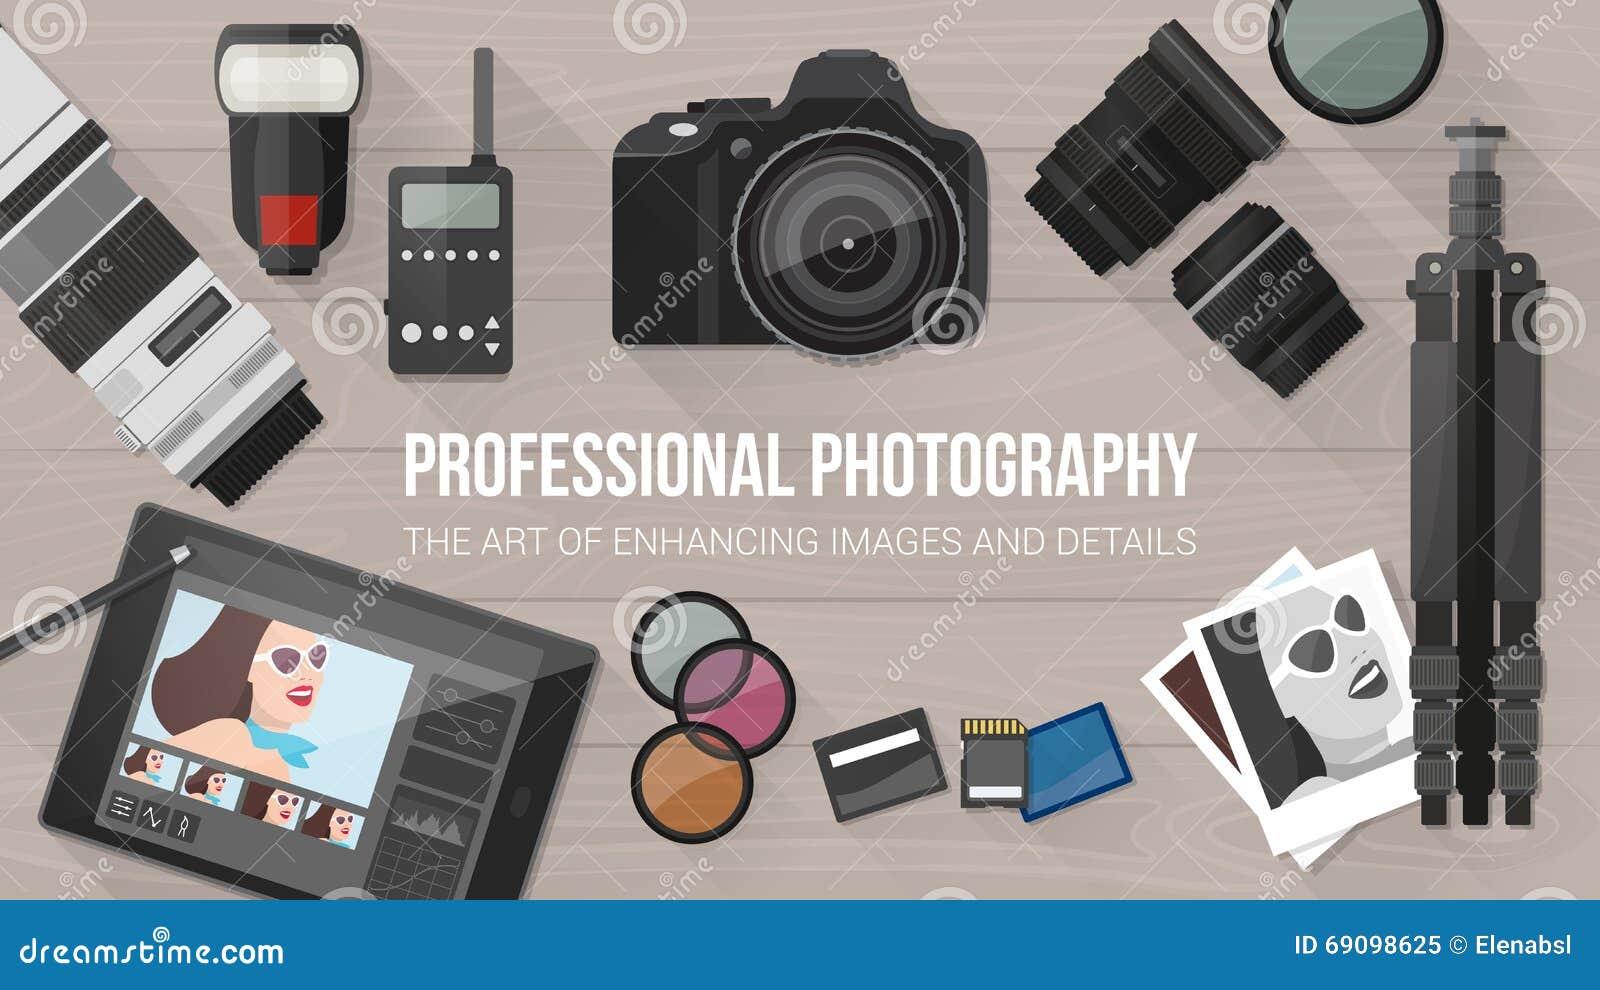 astronomy photography equipment - photo #36